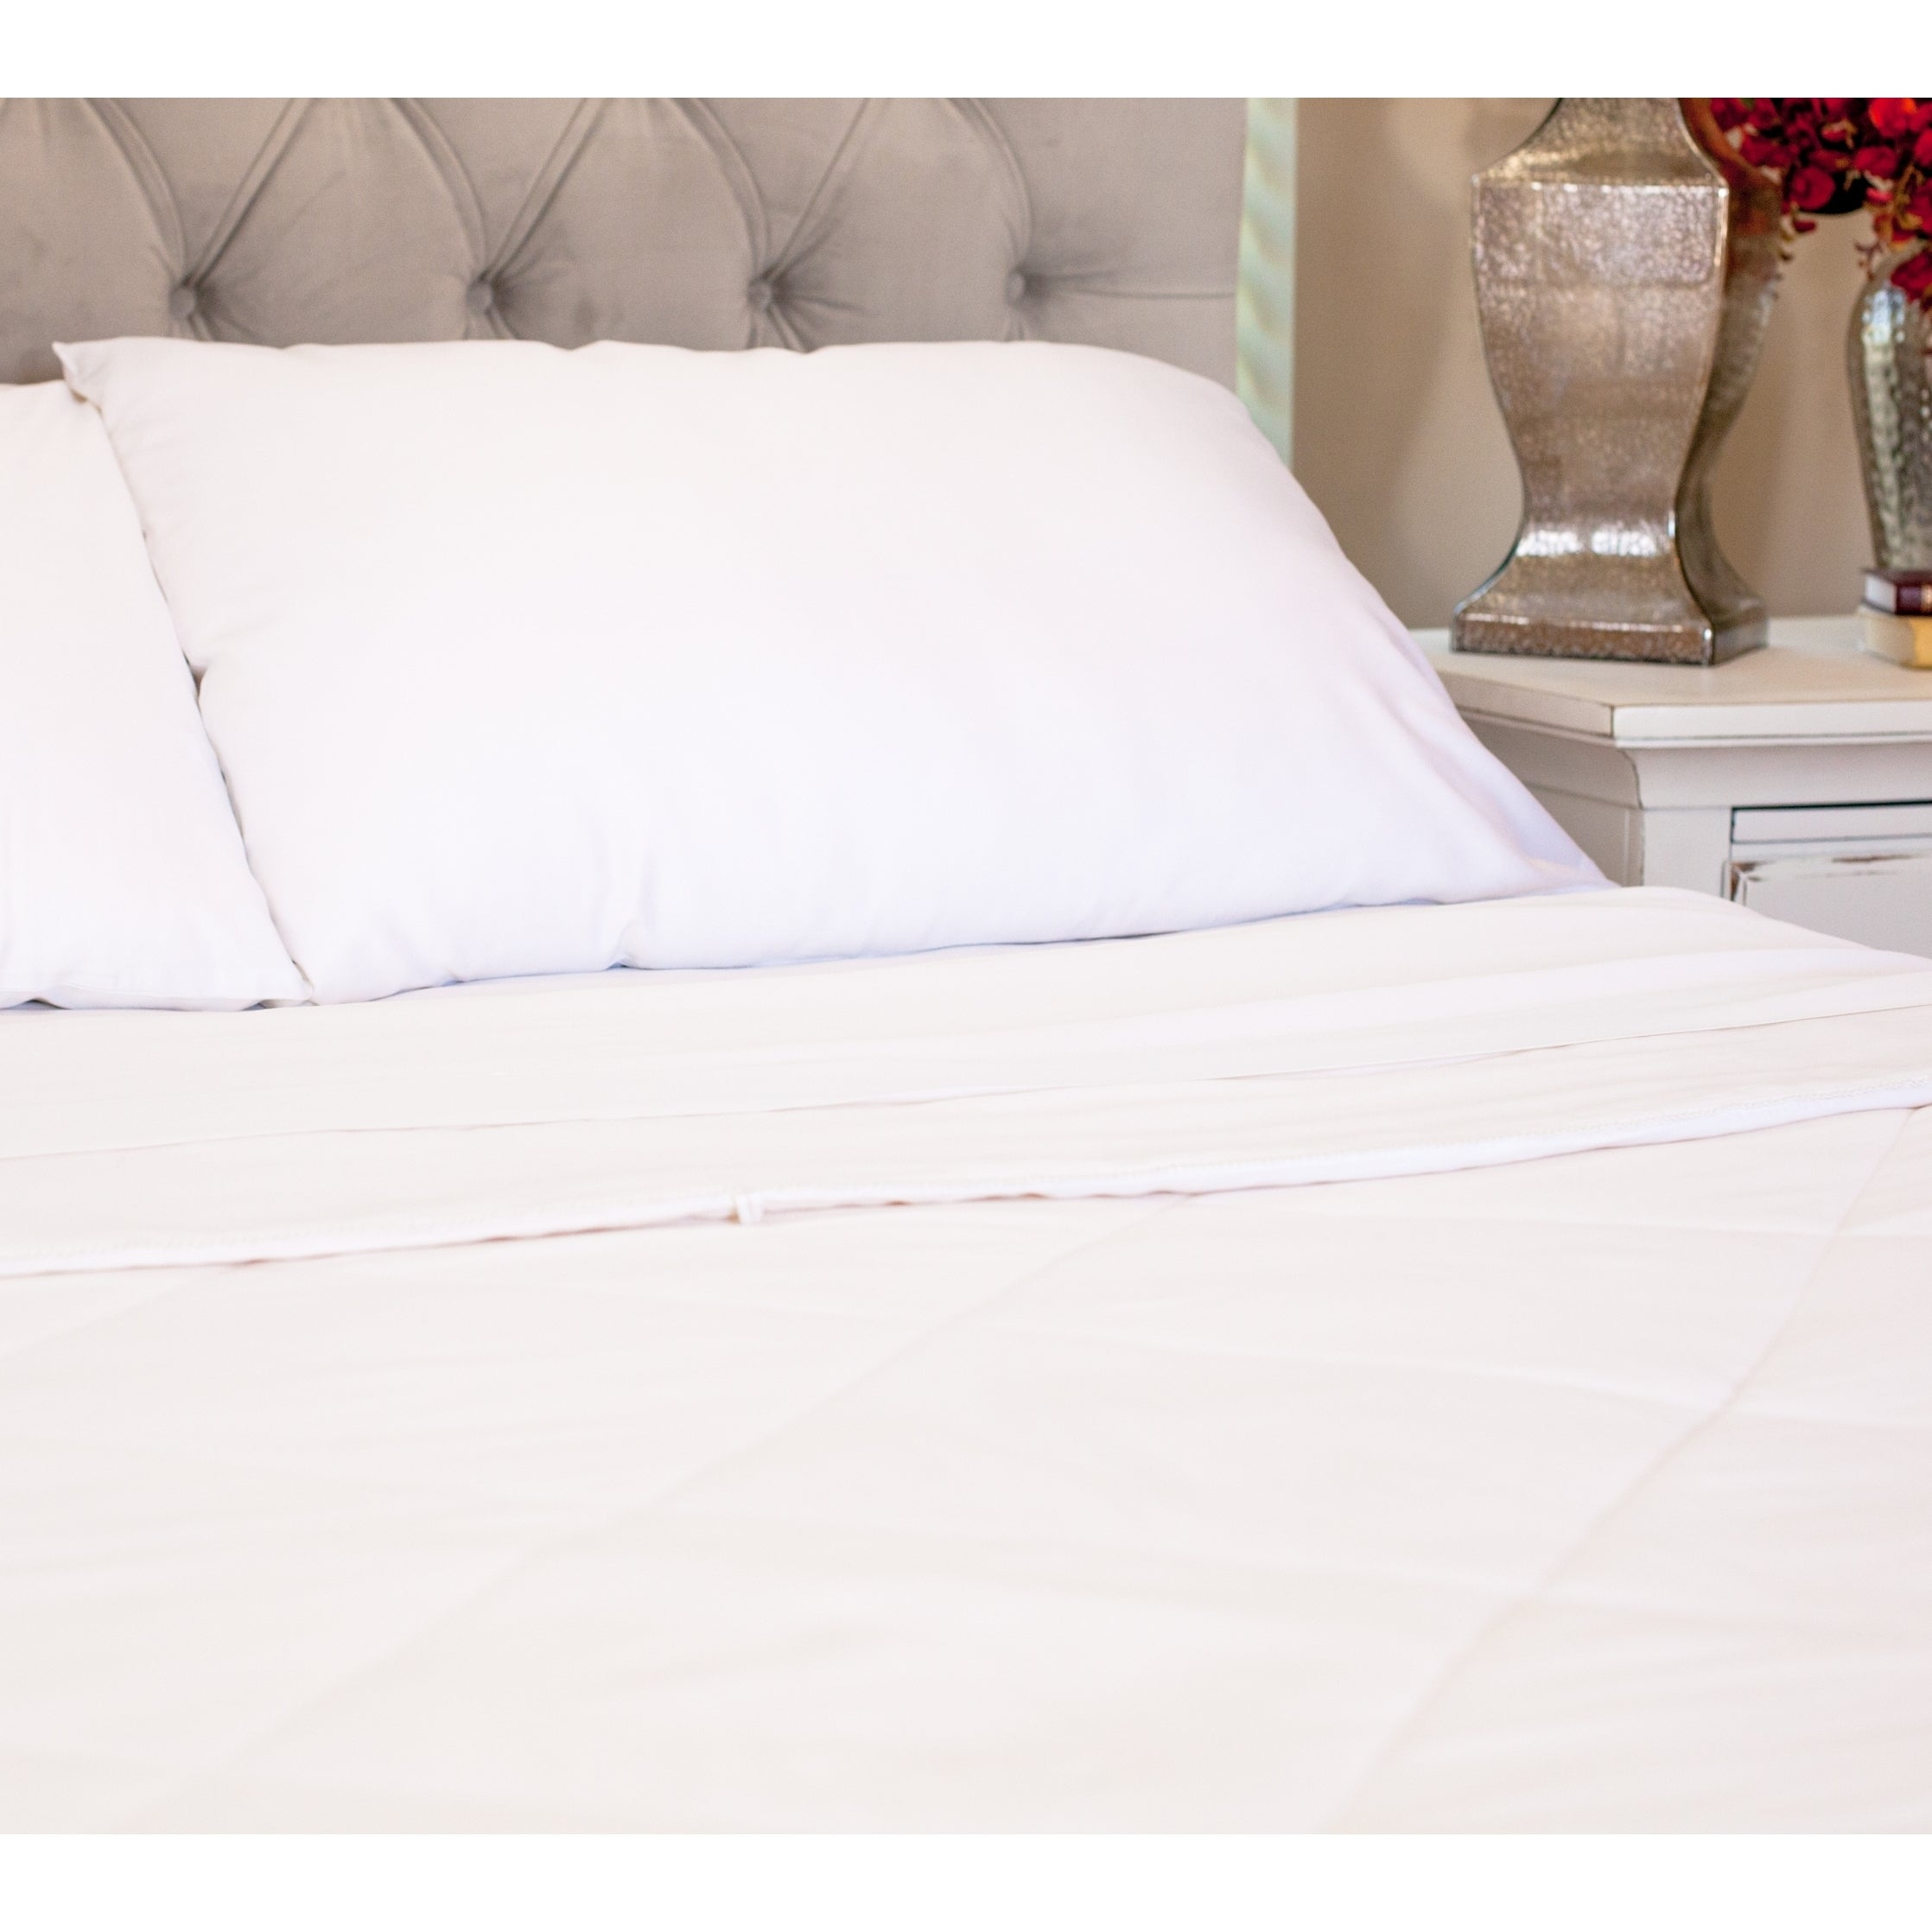 pin apartments pinterest silk comforter bedroom grey bedspread mulberry